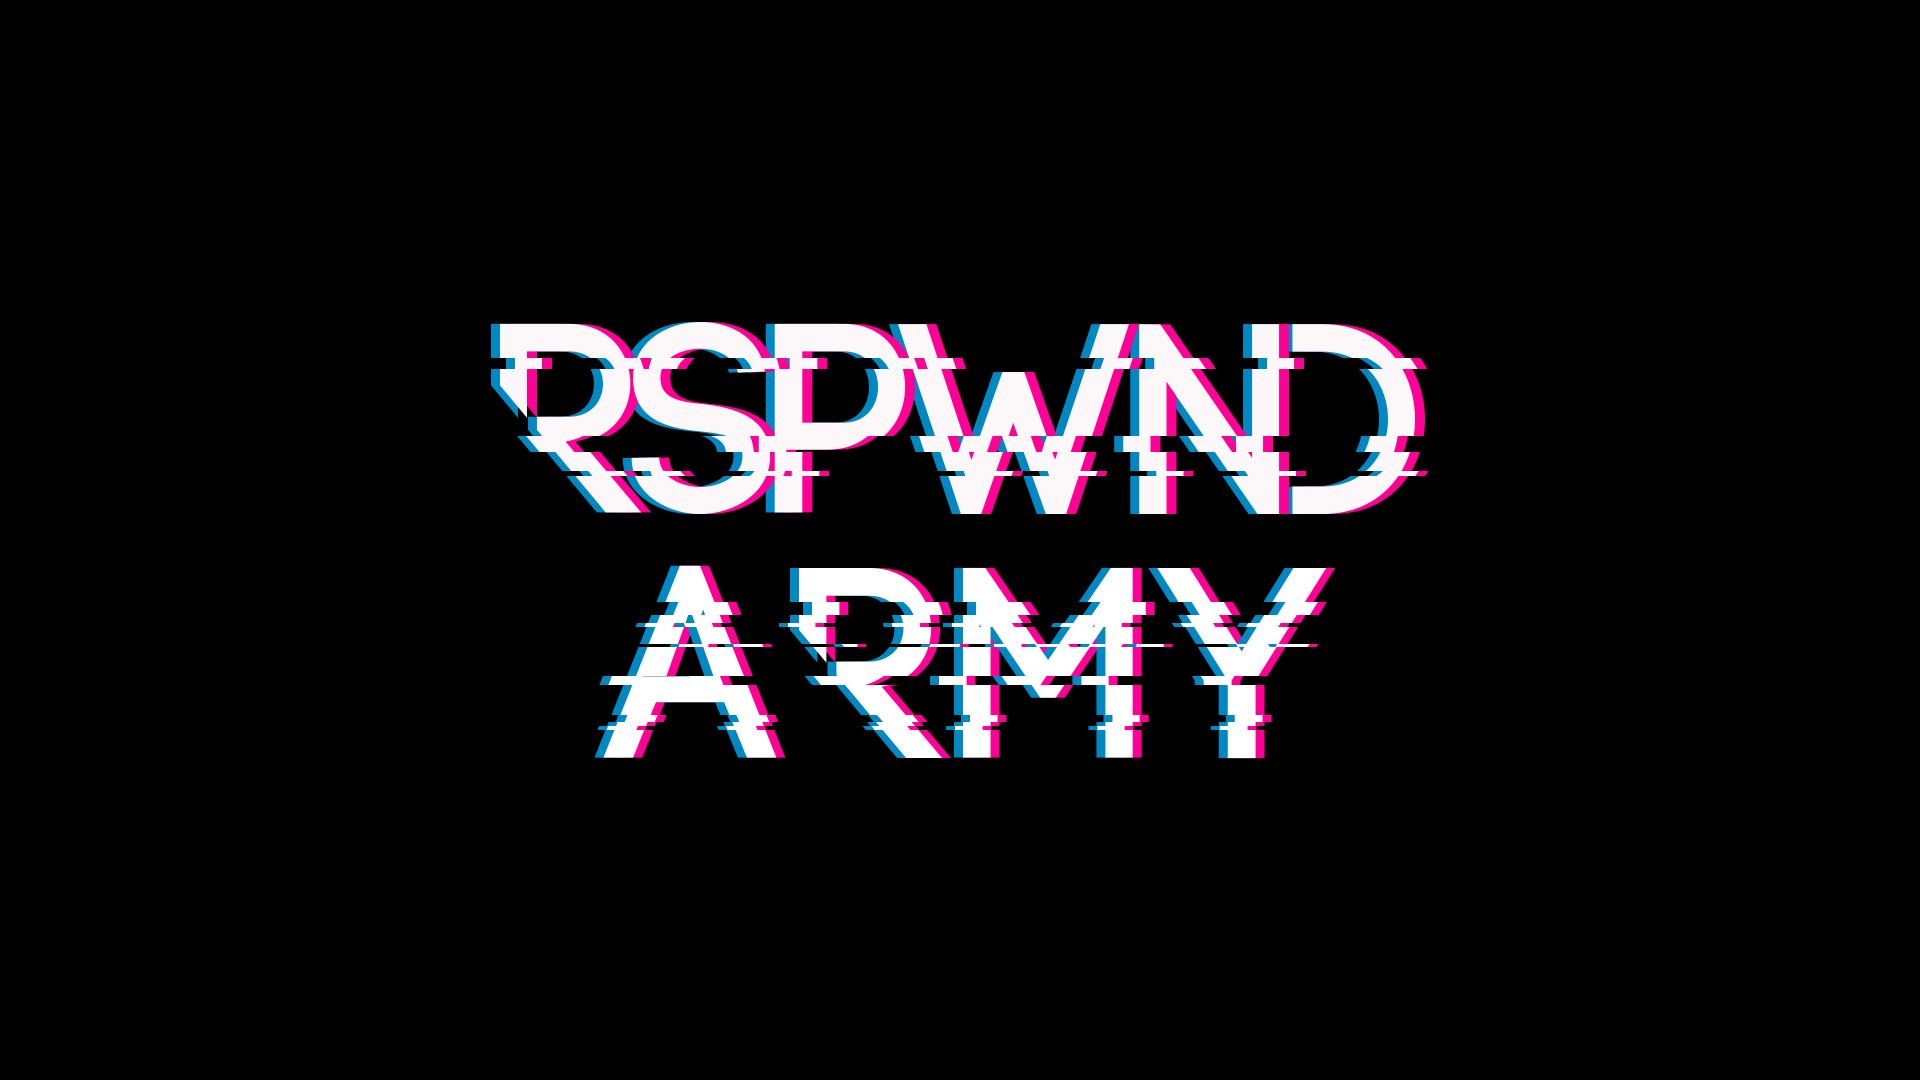 RSPWND ARMY